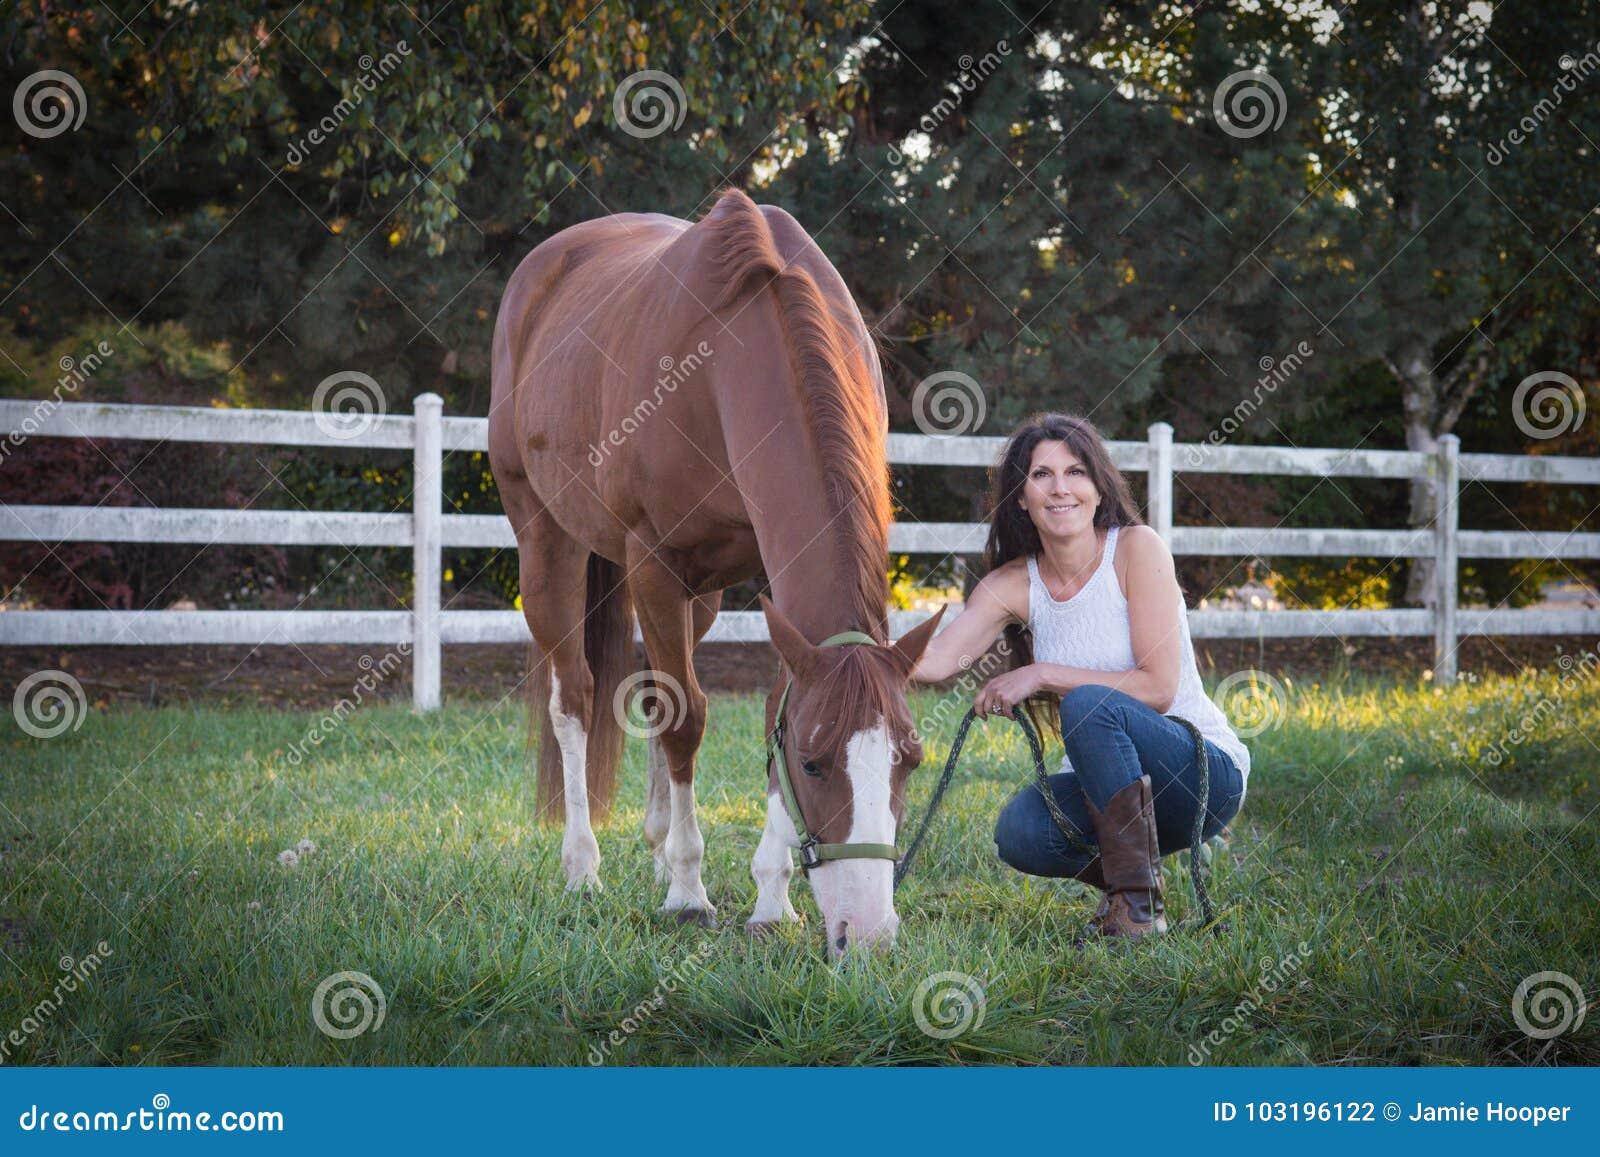 Horse Woman